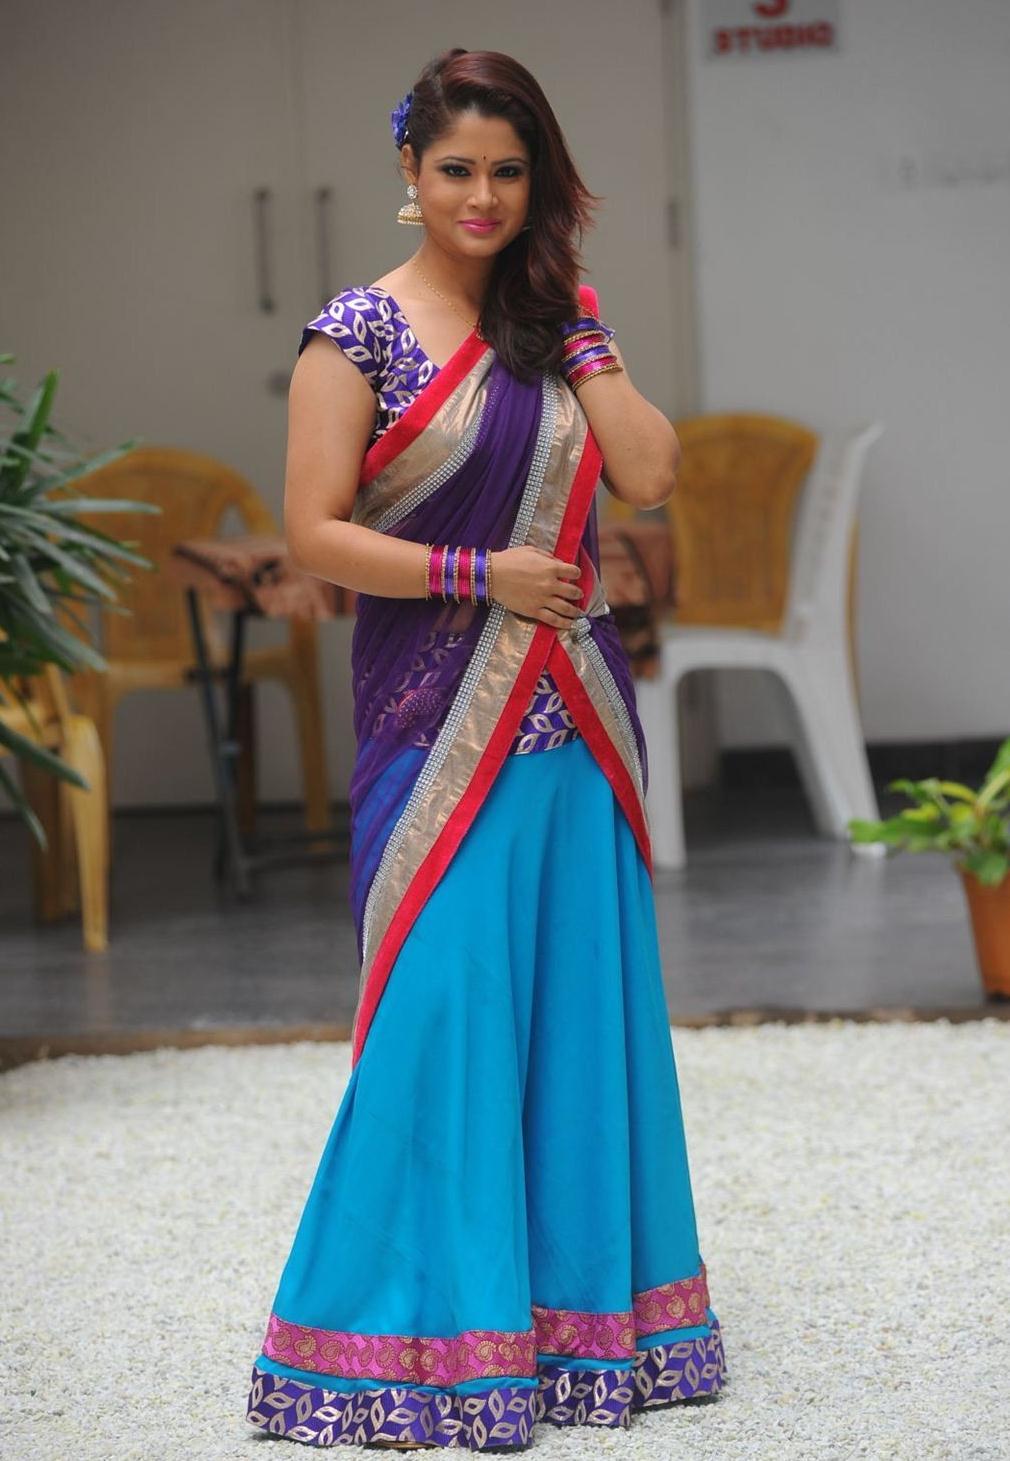 Tollywood Tv Anchor Shilpa Chakravarthy Stills In Blue Saree At Movie Audio Launch